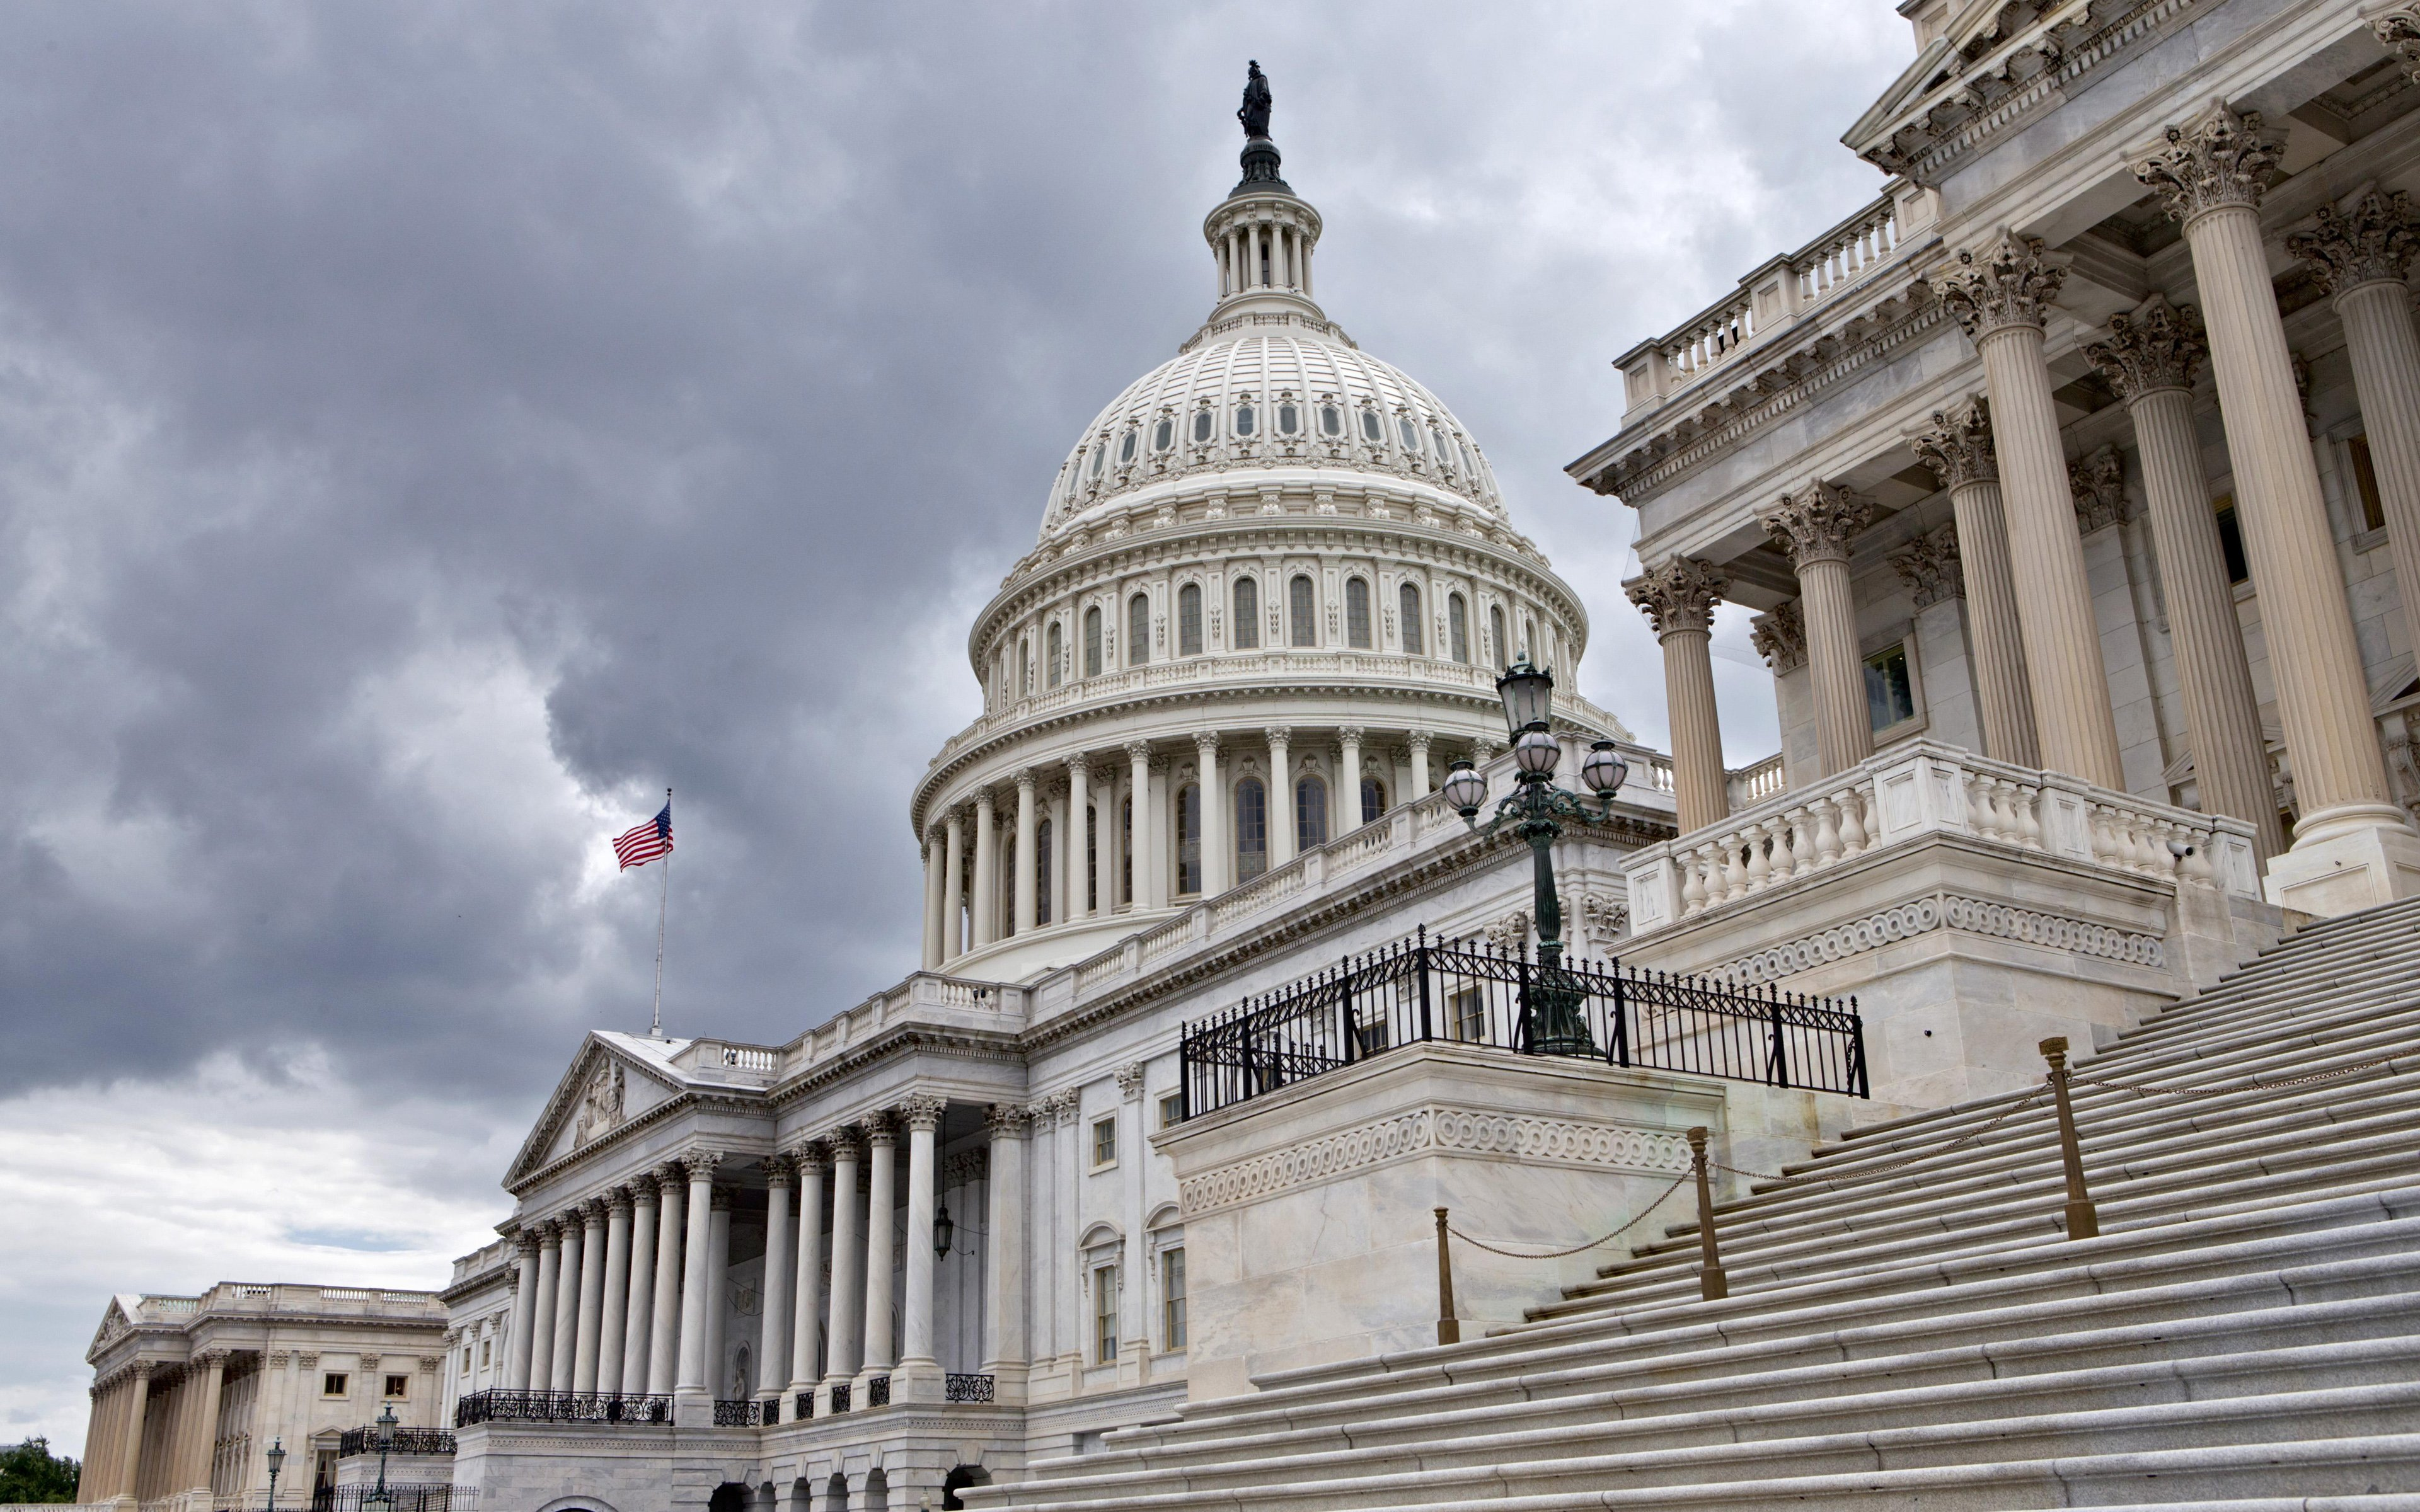 Download wallpapers Capitol Washington US Congress Capitol Hill 3840x2400